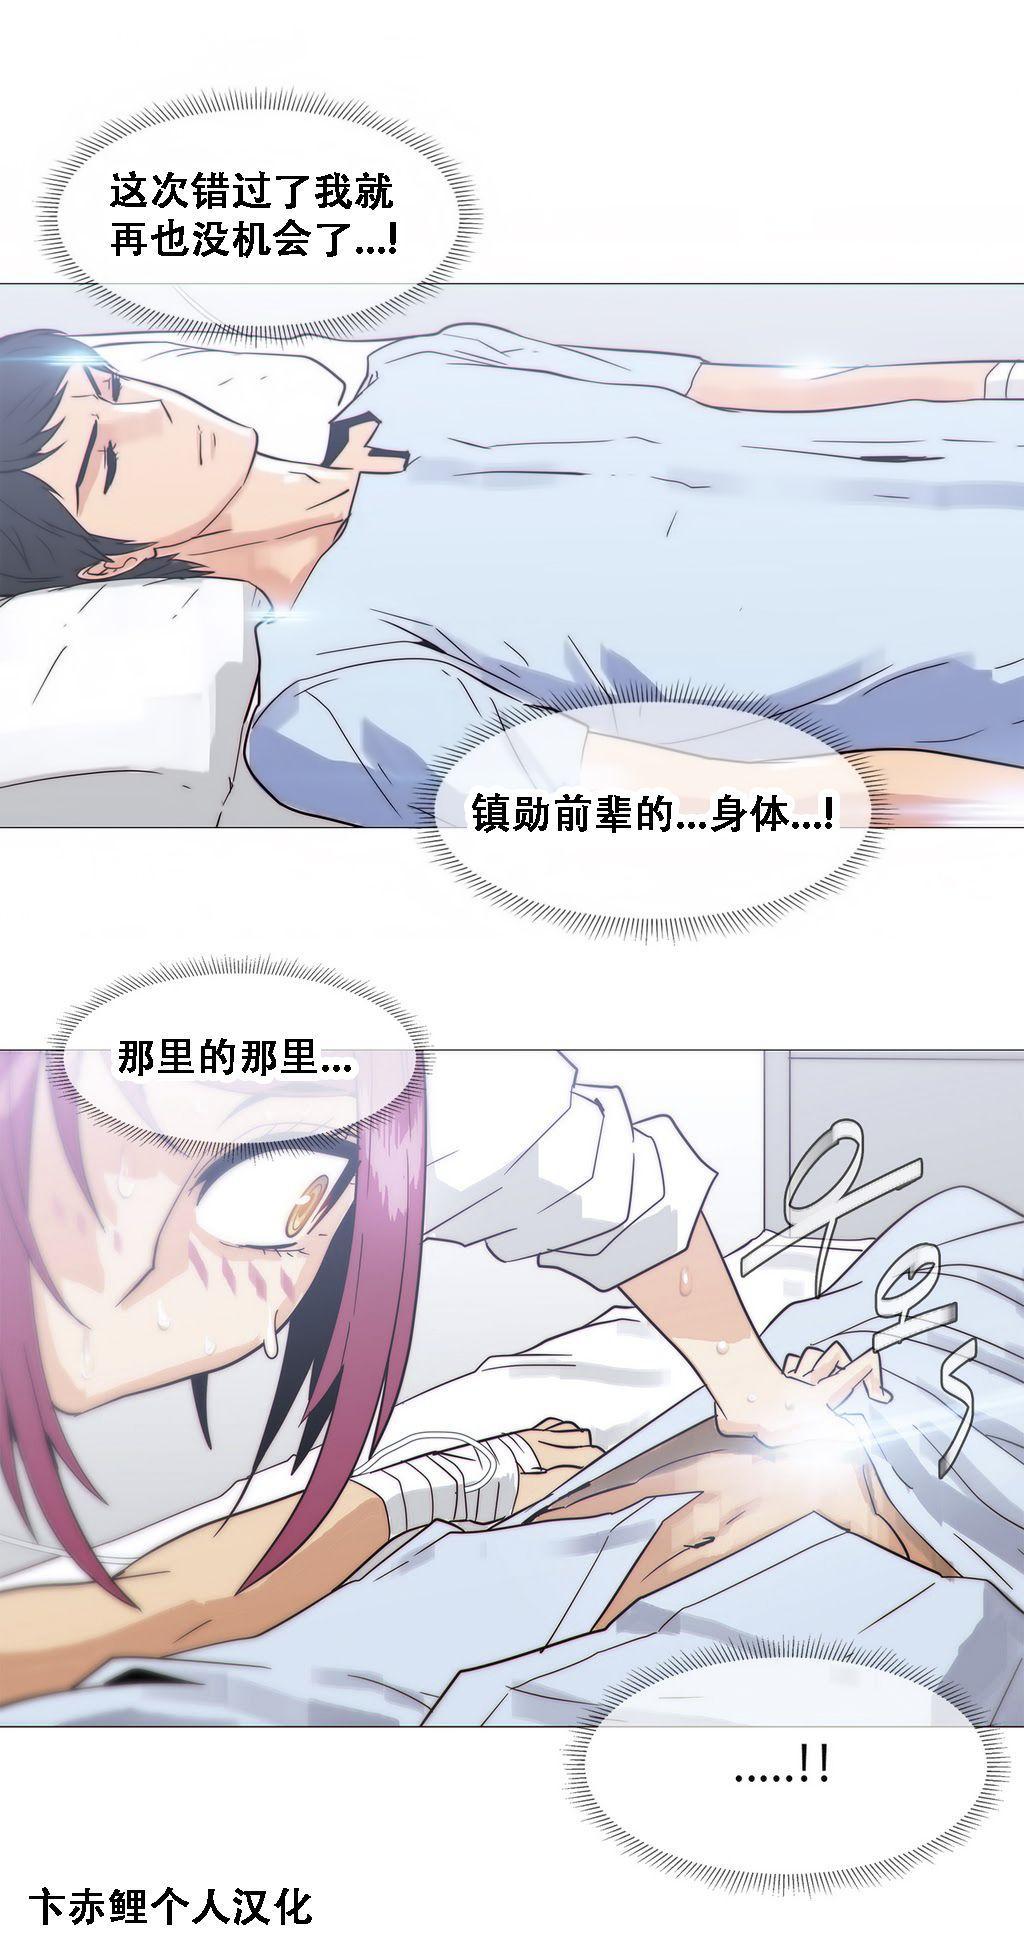 HouseHold Affairs 【卞赤鲤个人汉化】1~33话(持续更新中) 415